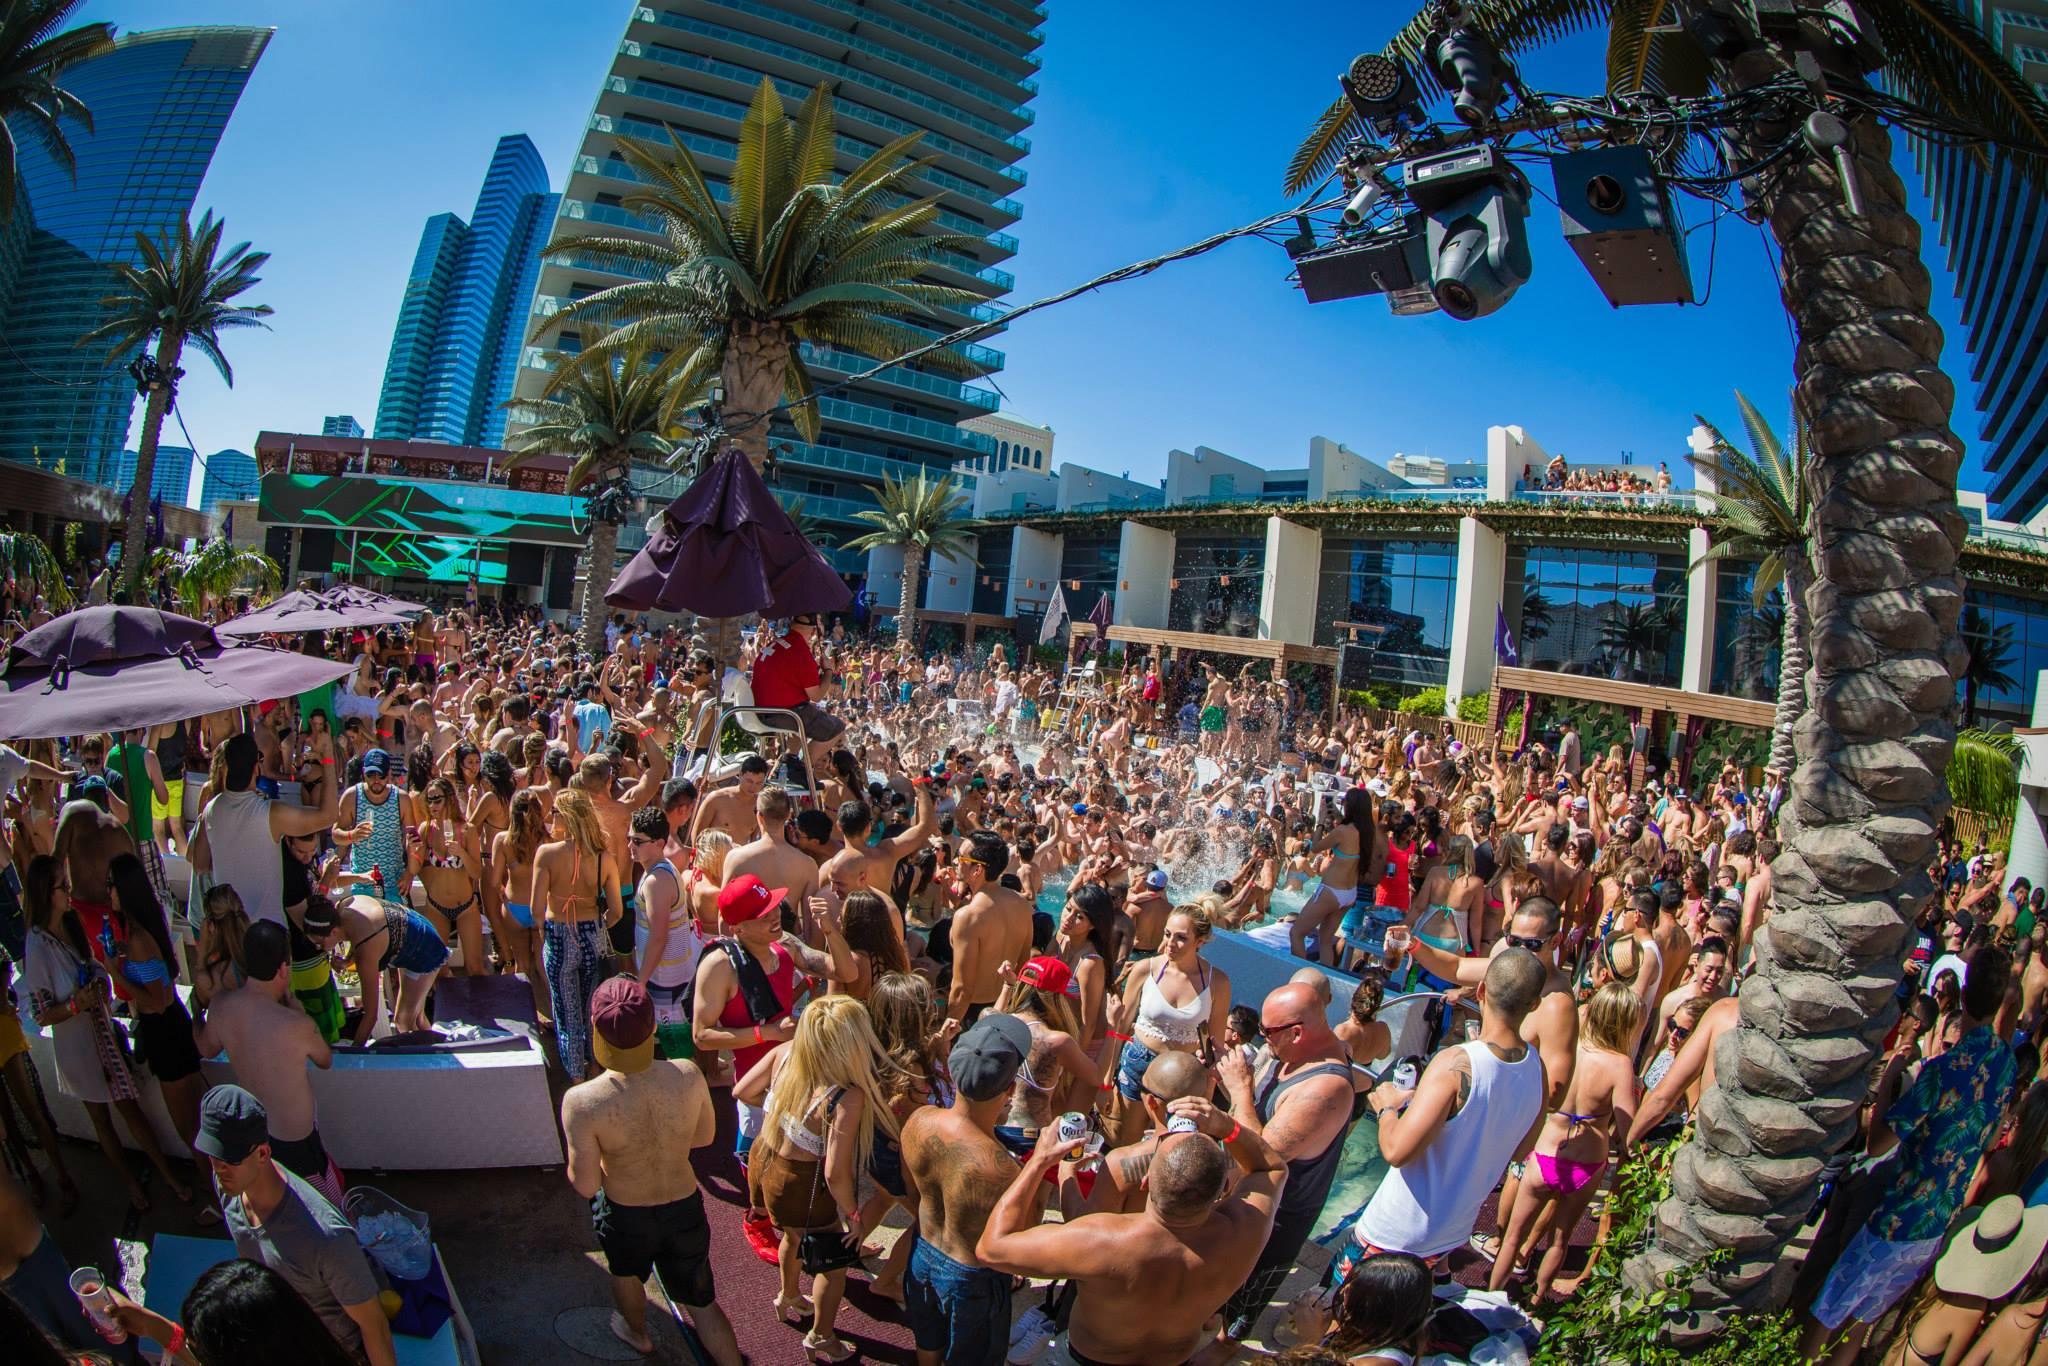 Marquee Dayclub at The Cosmopolitan Las Vegas